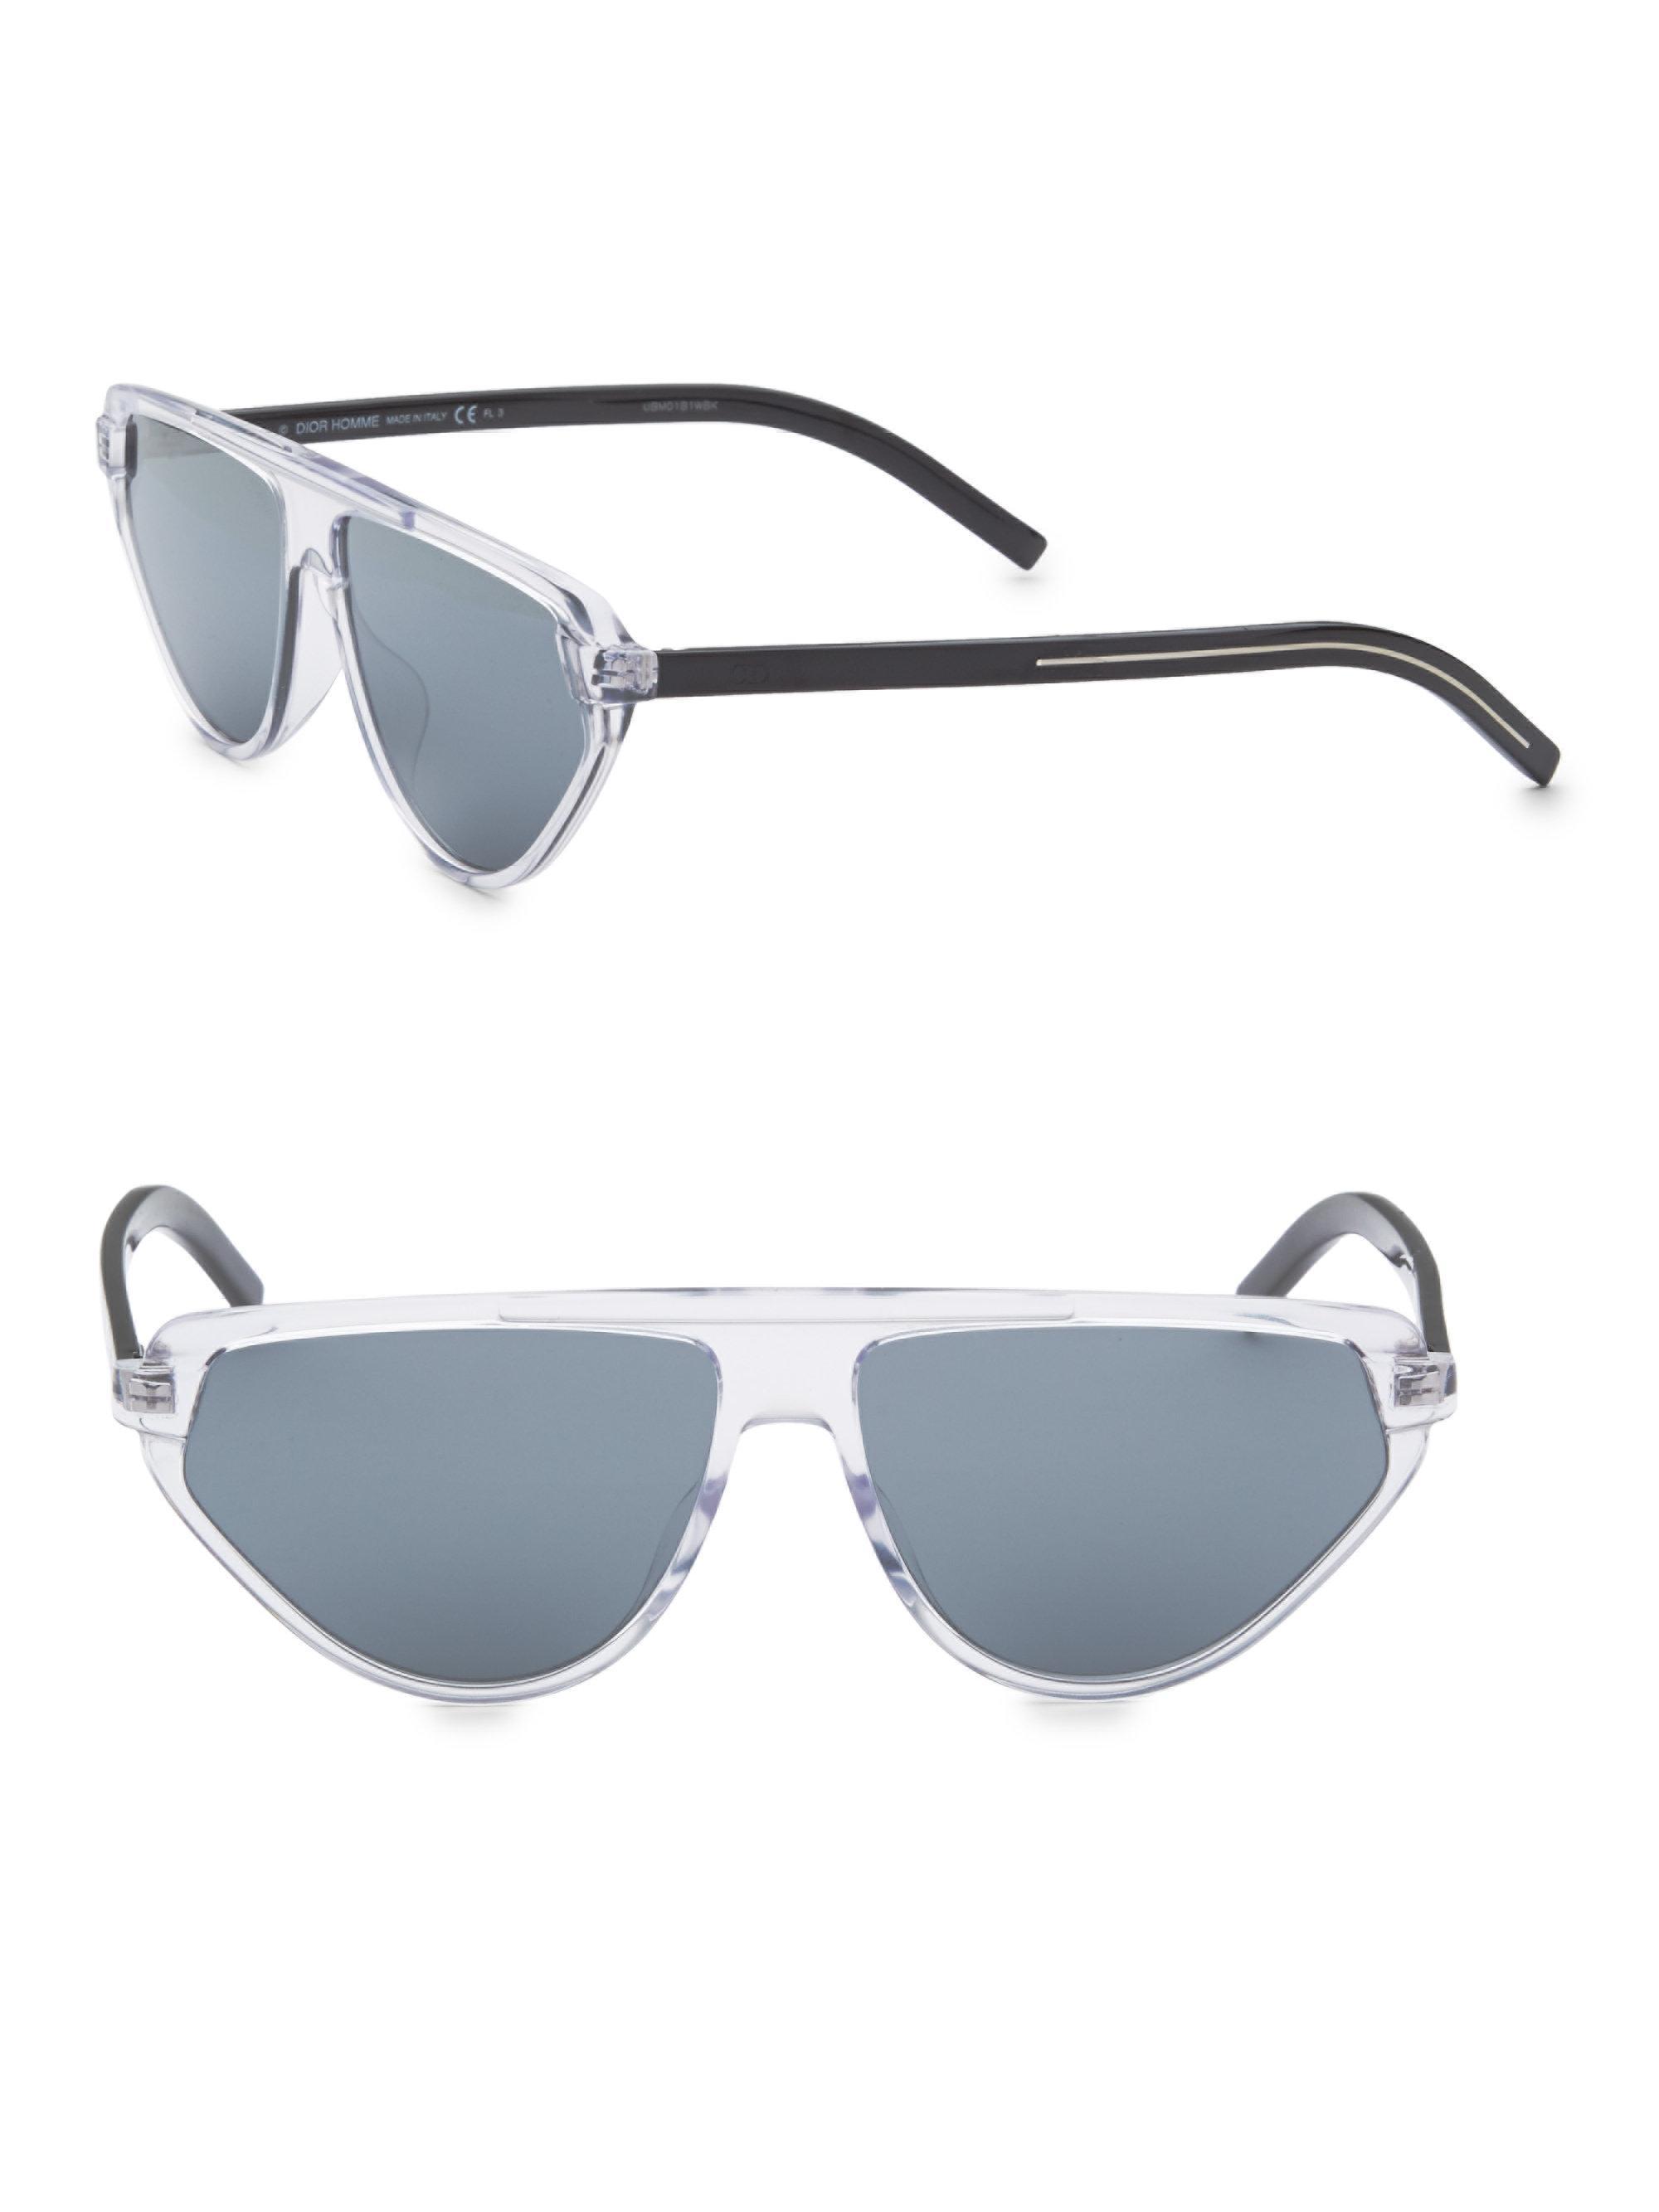 97d521e2bbd Dior Homme 60mm Aviator Sunglasses for Men - Lyst